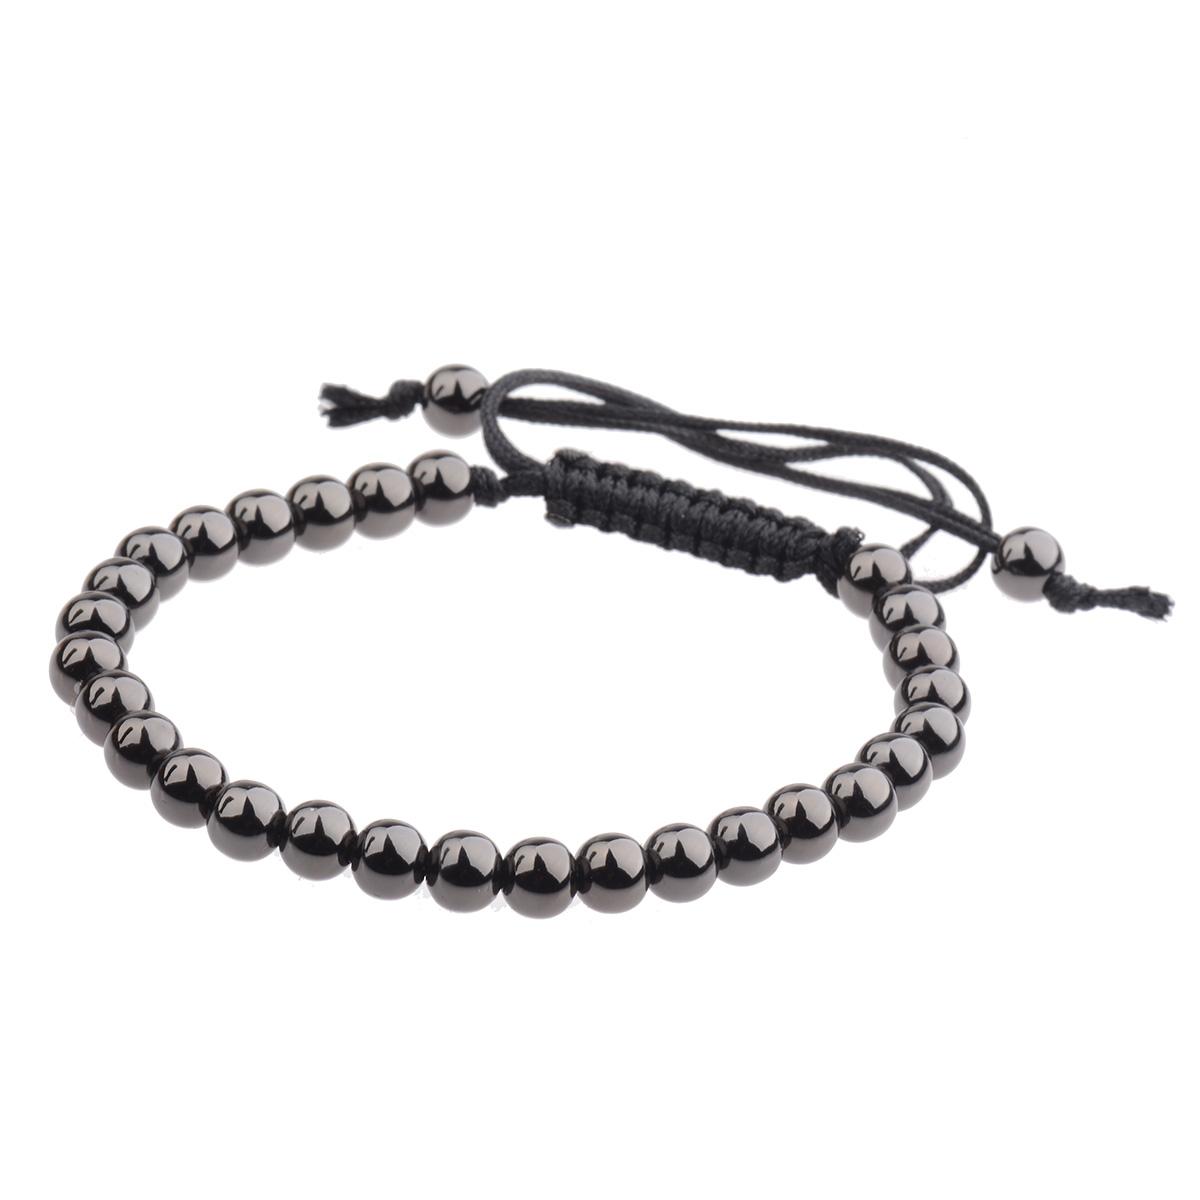 Fashion-Mens-Bracelet-24kt-Gold-Plated-Micro-Pave-Zircon-Macrame-Bracelets-6MM thumbnail 16